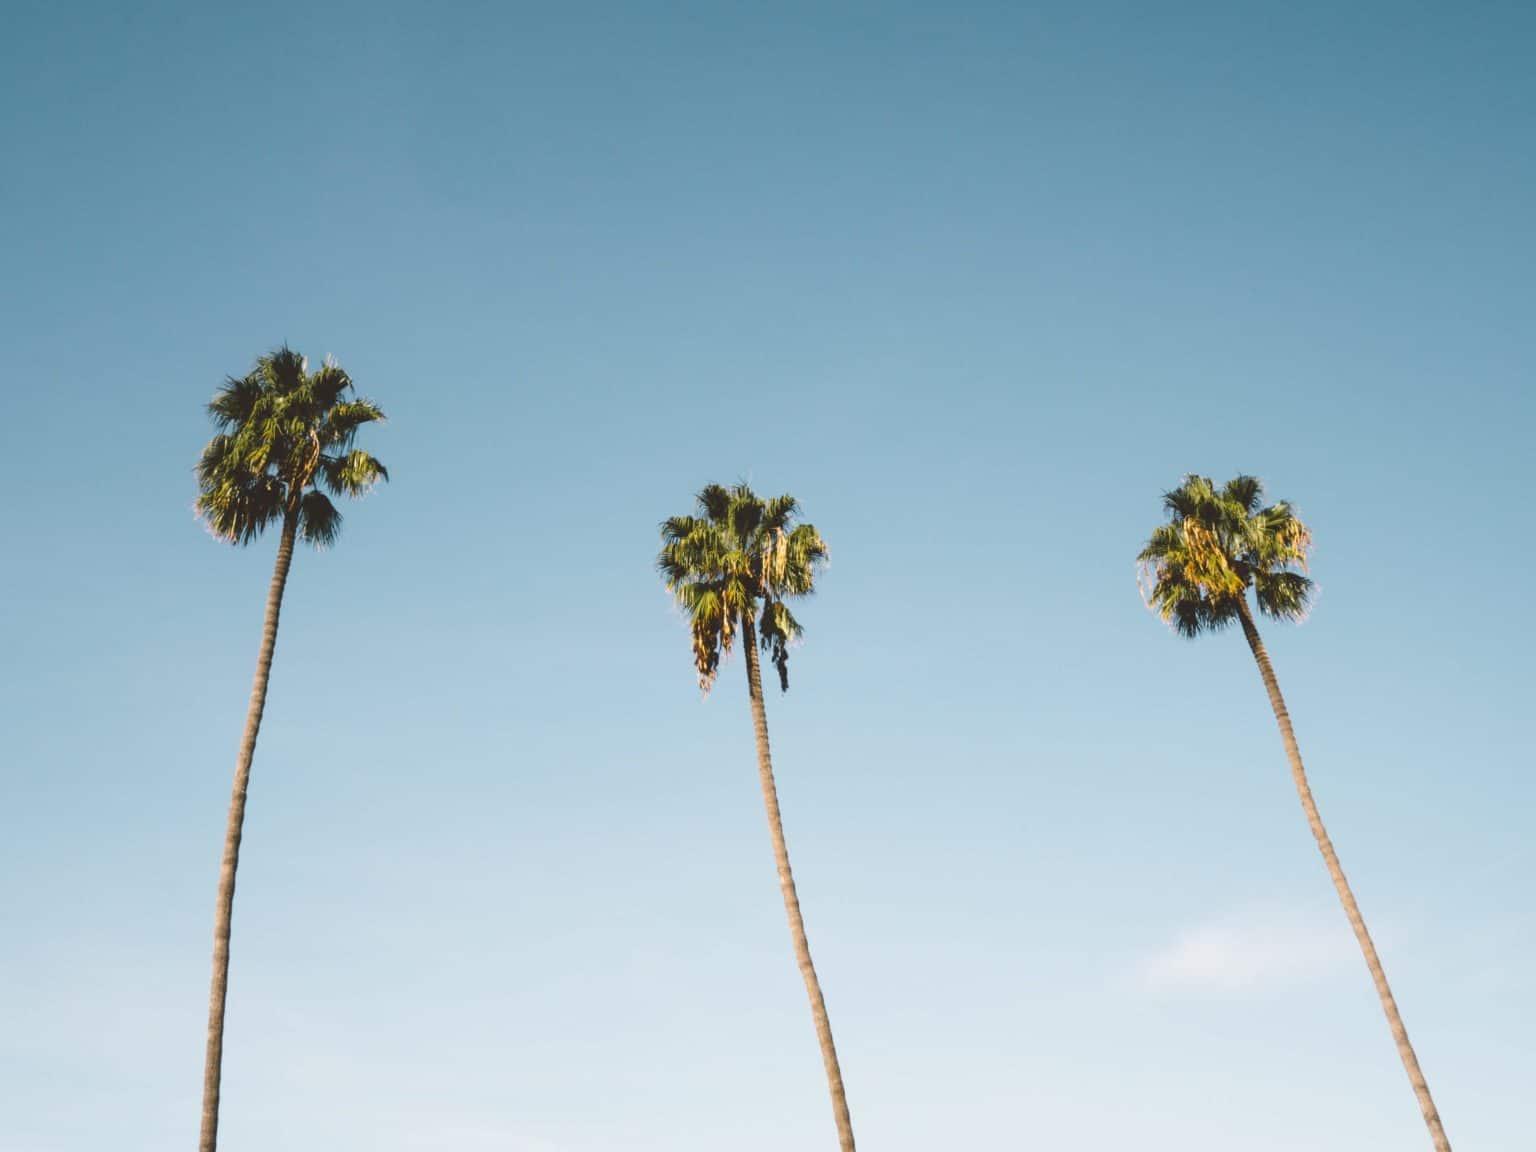 Walking tour in San Diego